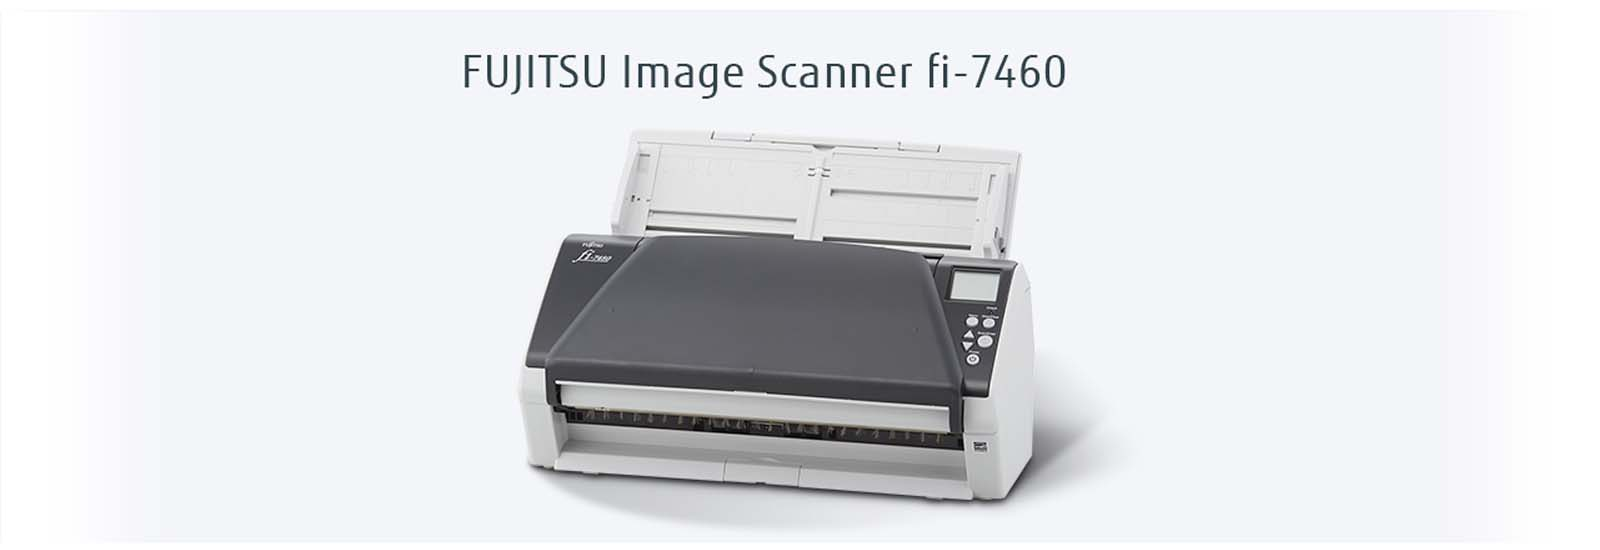 Fujitsu F-7460